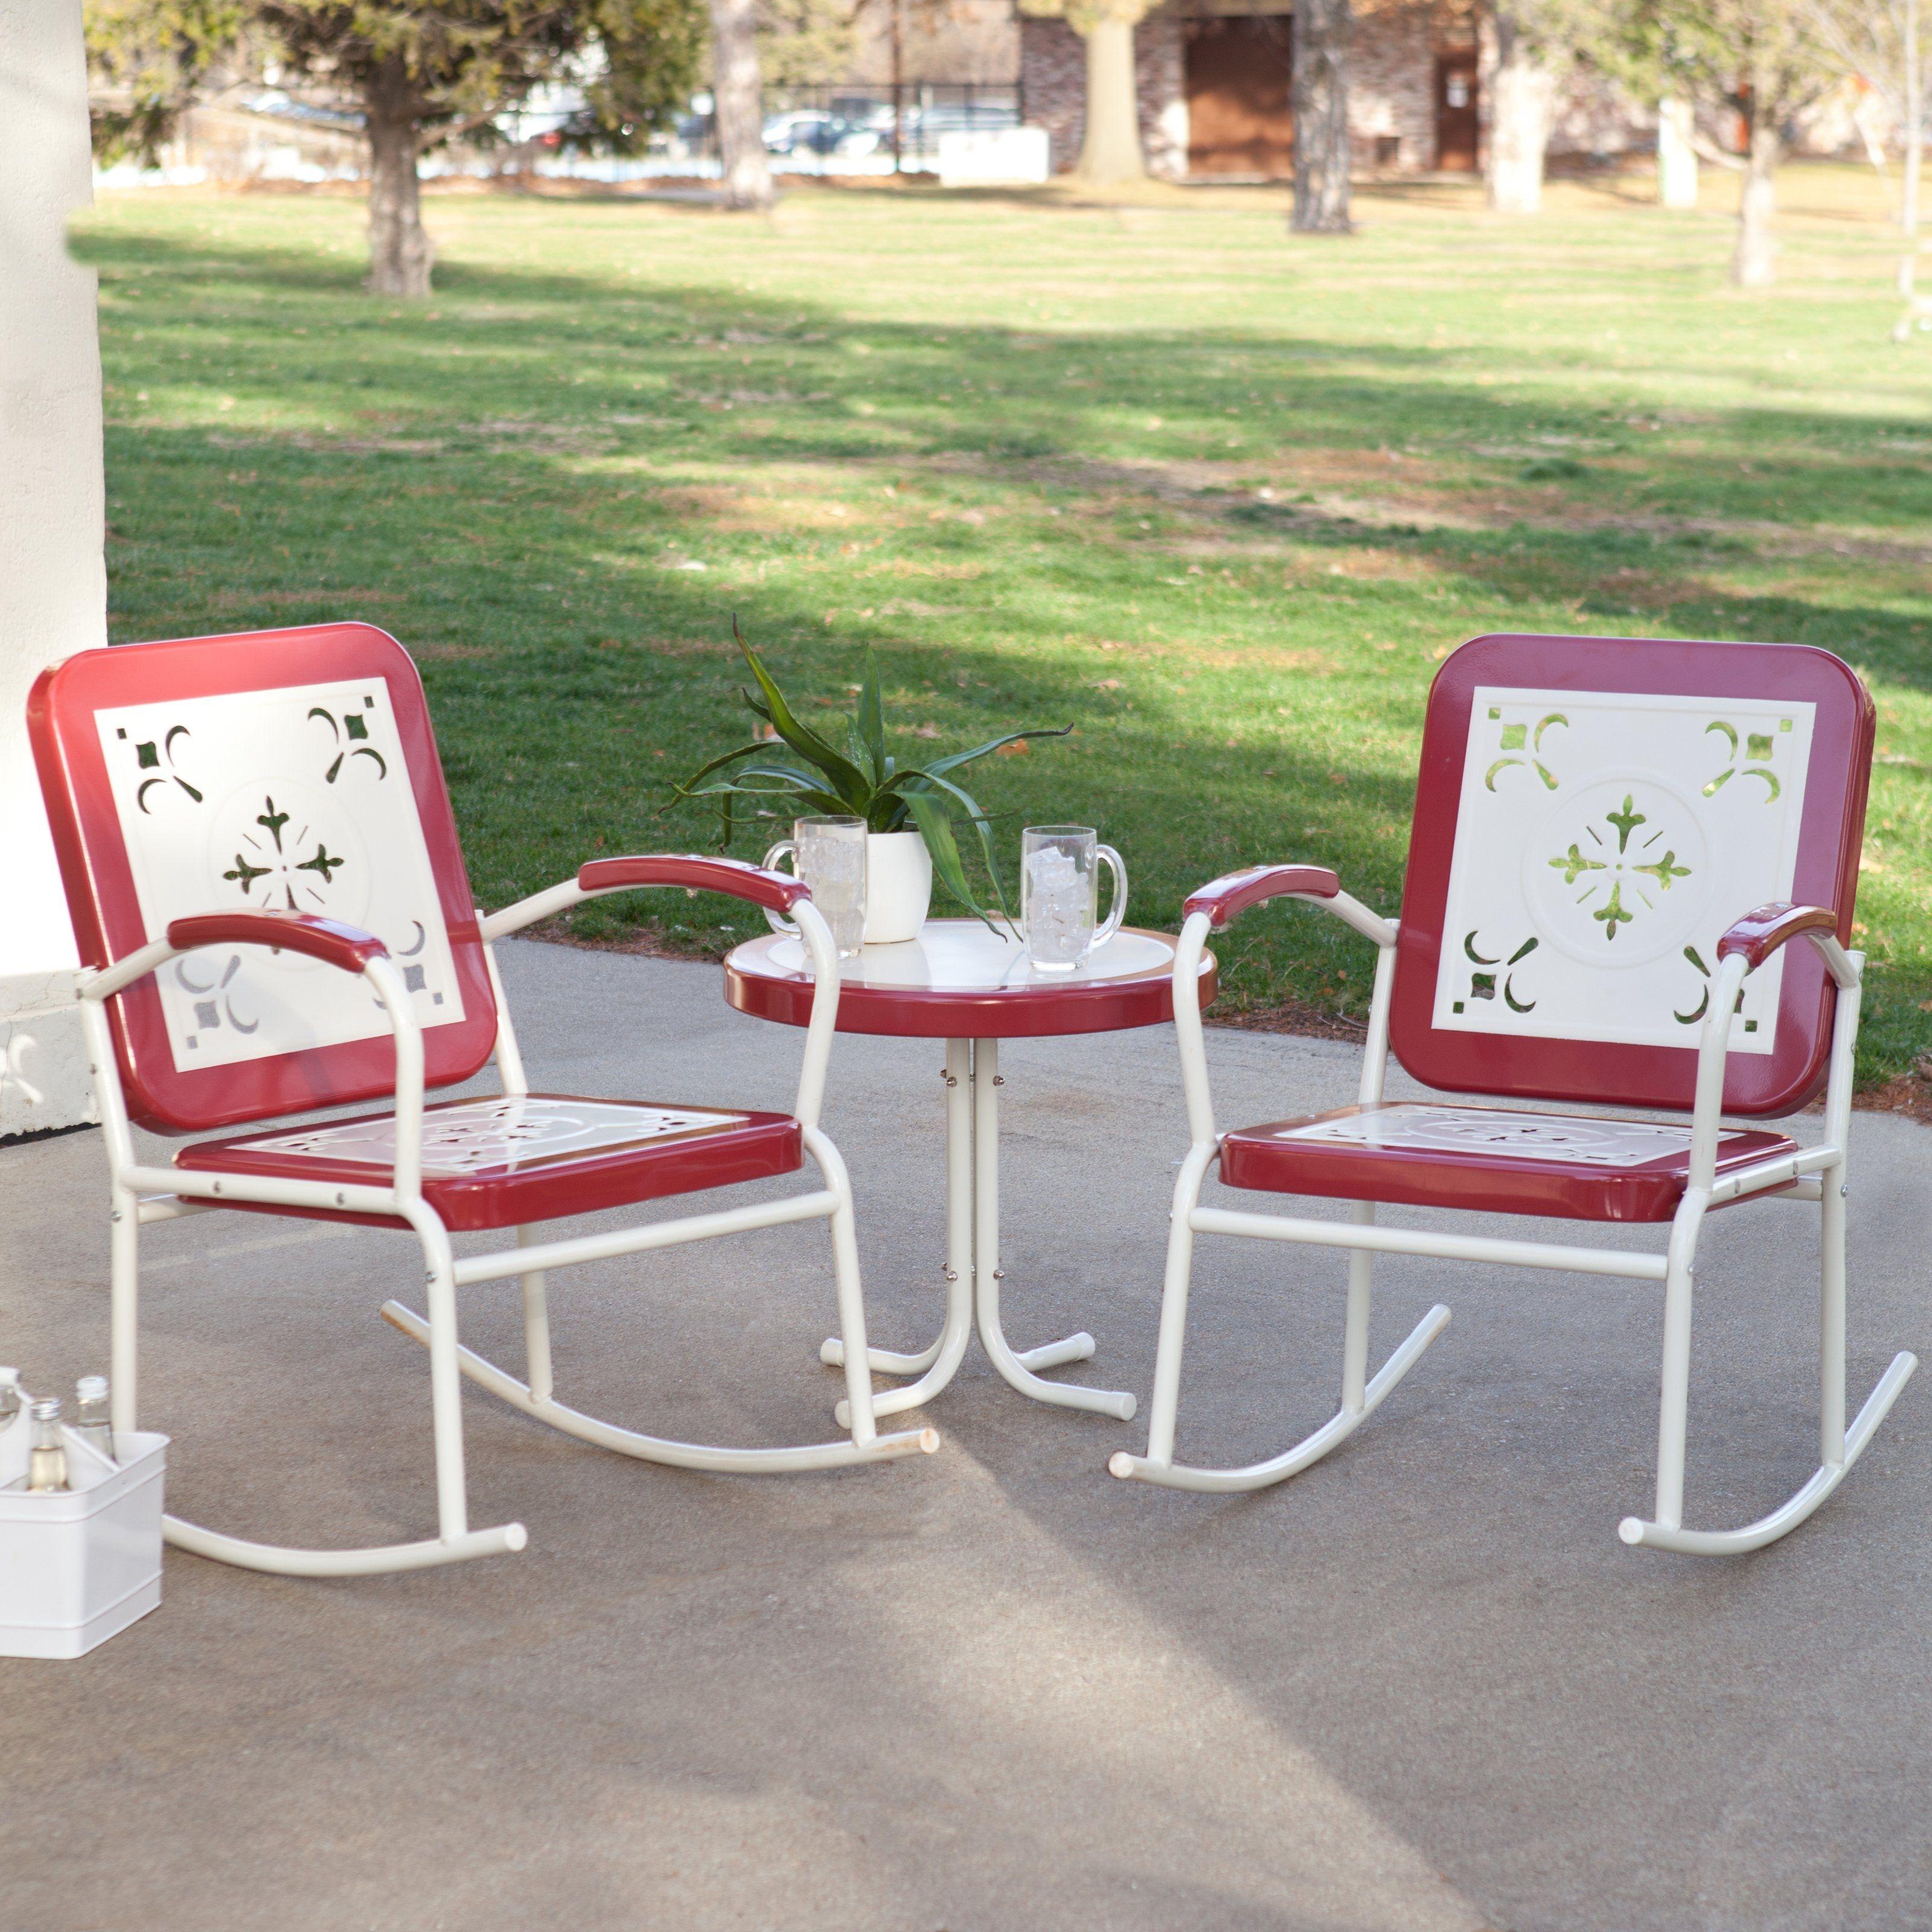 Walmart Folding Lawn Chairs Lounge Chair Lovely Patio Lounge Chairs  Walmart Patio Chaise Lounge